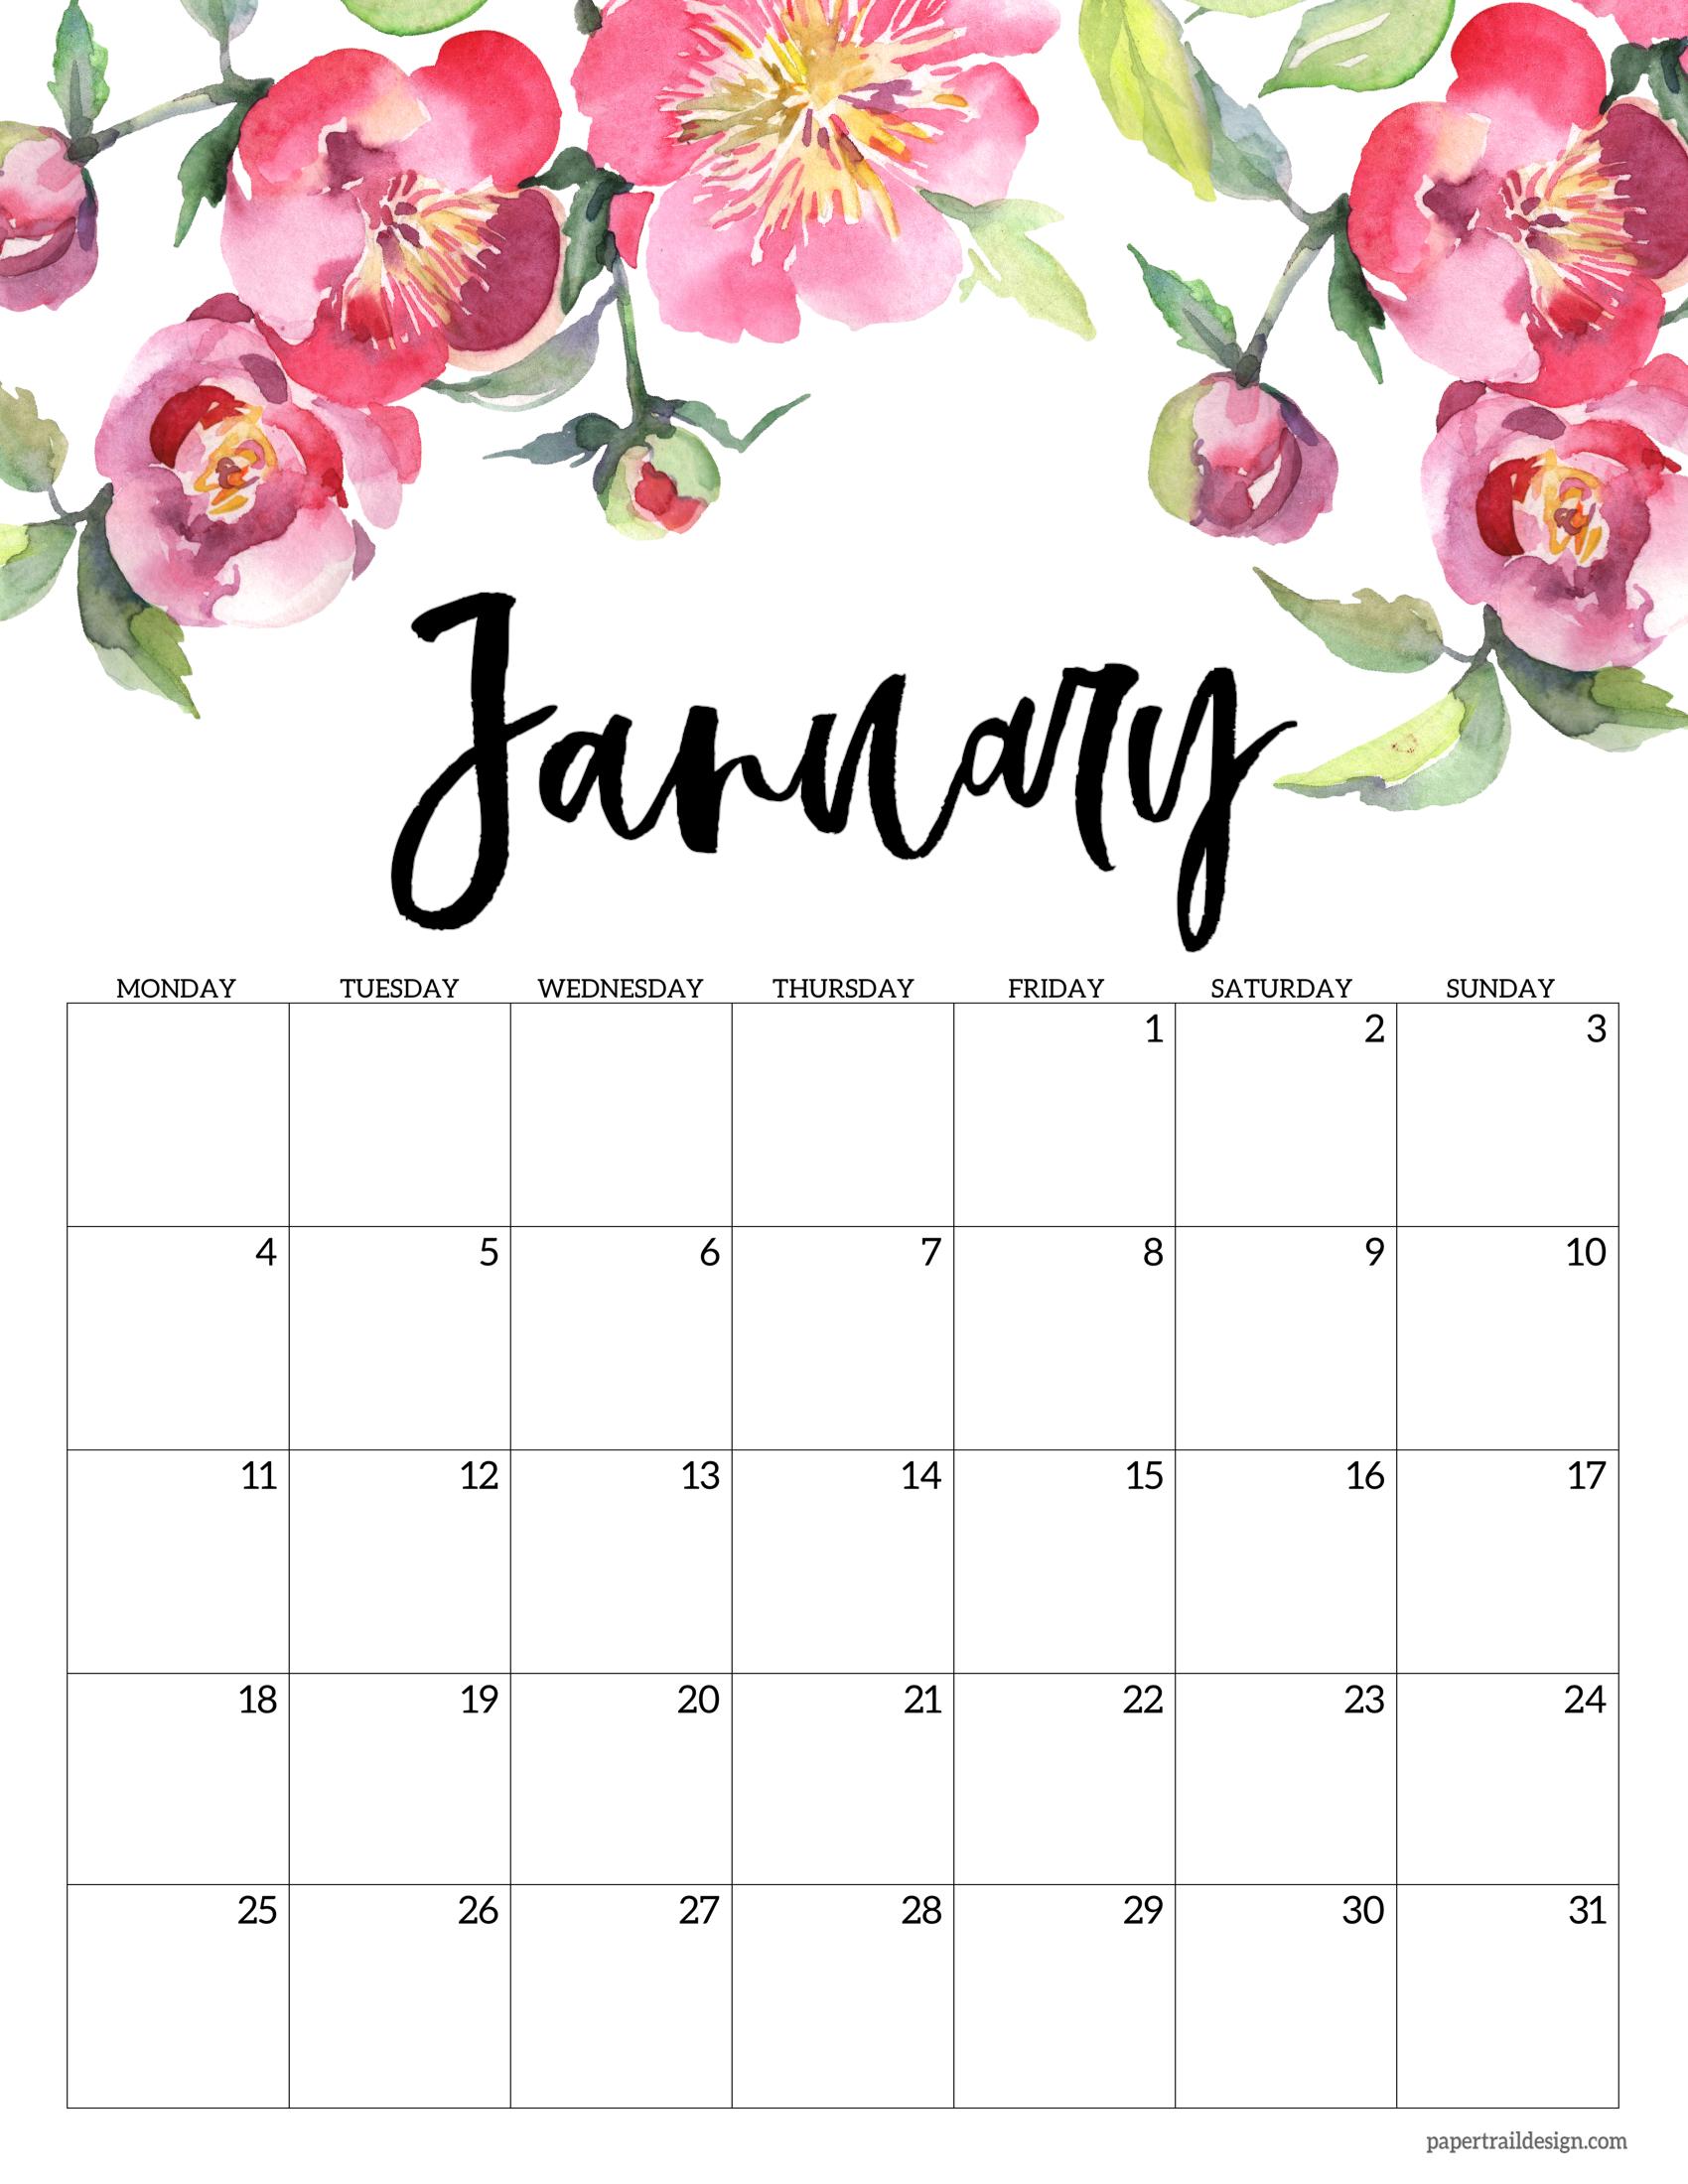 Free Printable 2021 Floral Calendar - Monday Start   Paper ...